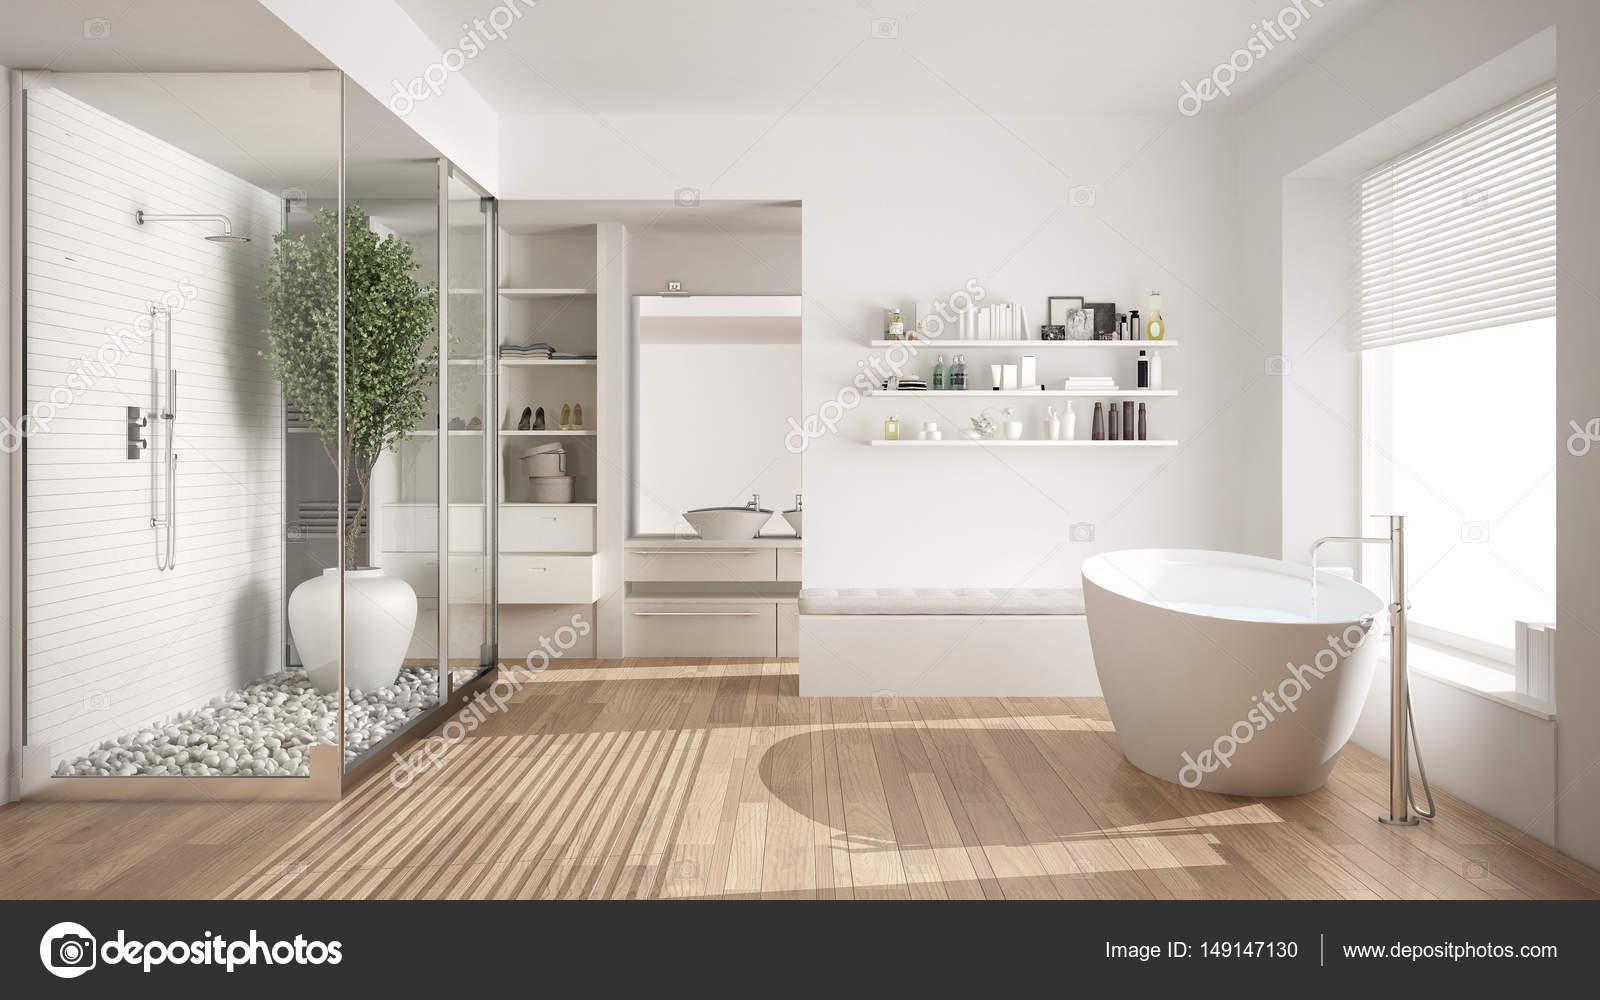 Minimalist white scandinavian bathroom with walk-in closet, clas ...